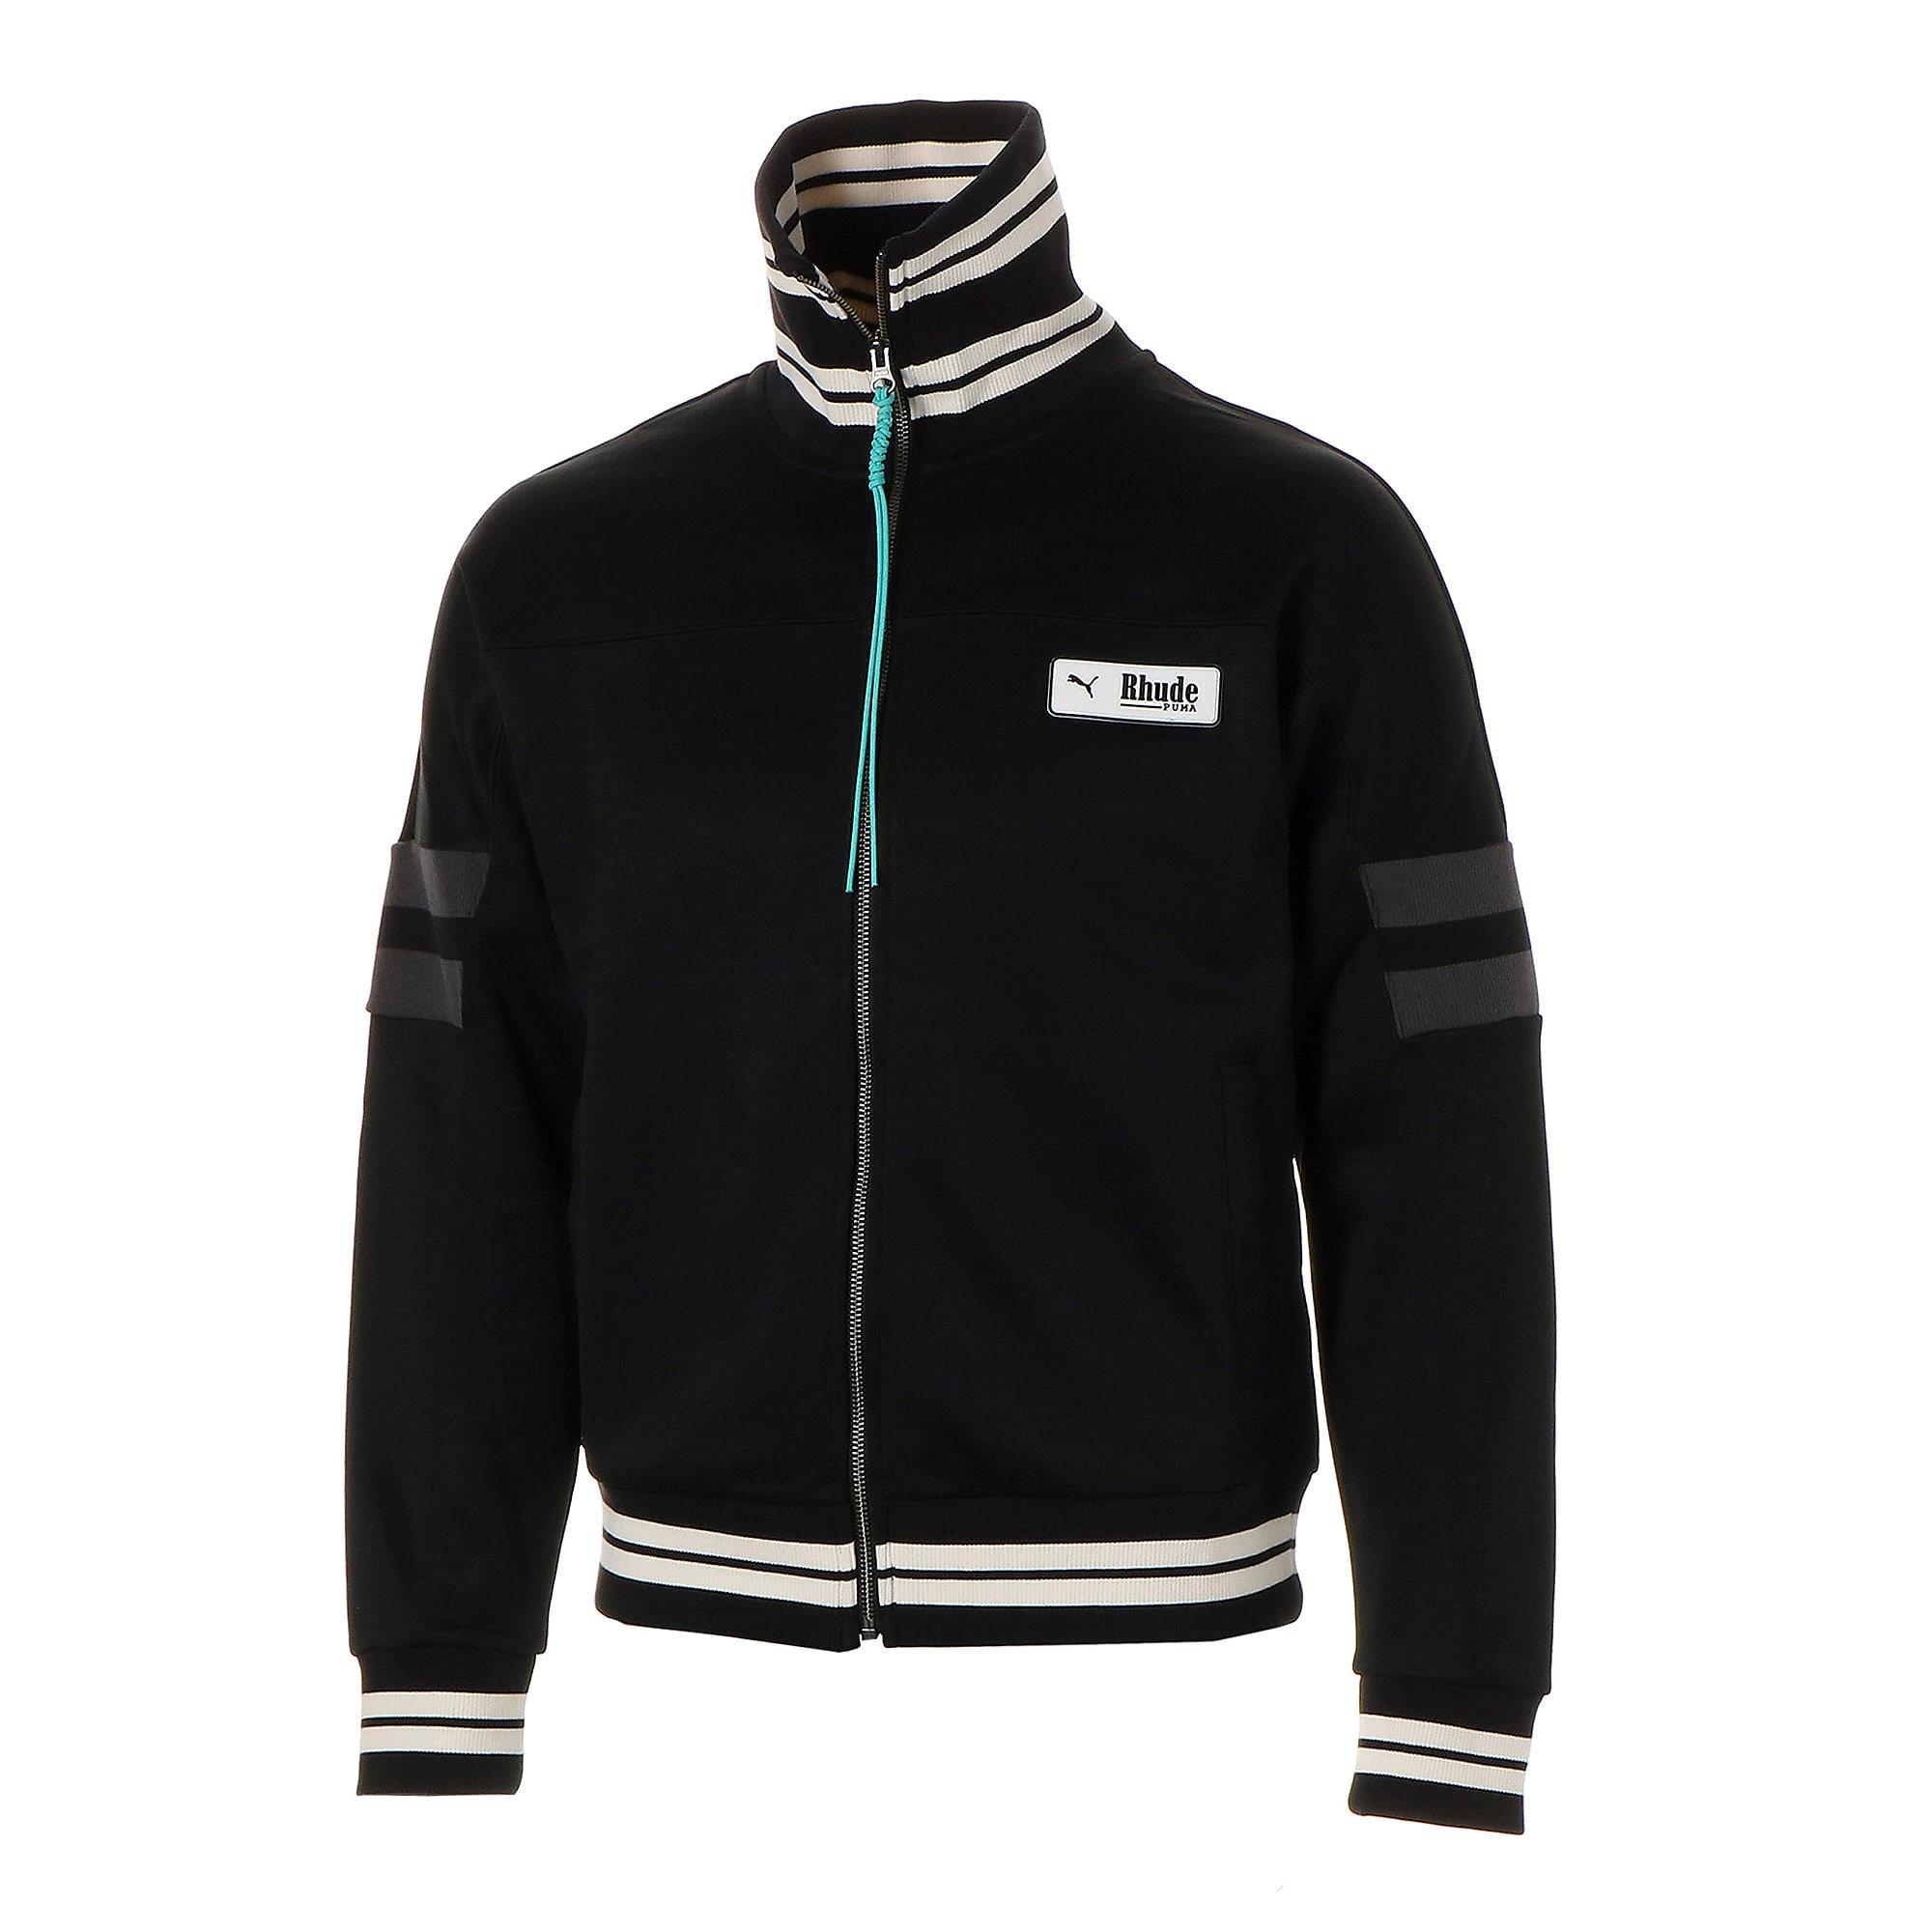 Thumbnail 1 of PUMA x RHUDE XTG Men's Track Jacket, Puma Black, medium